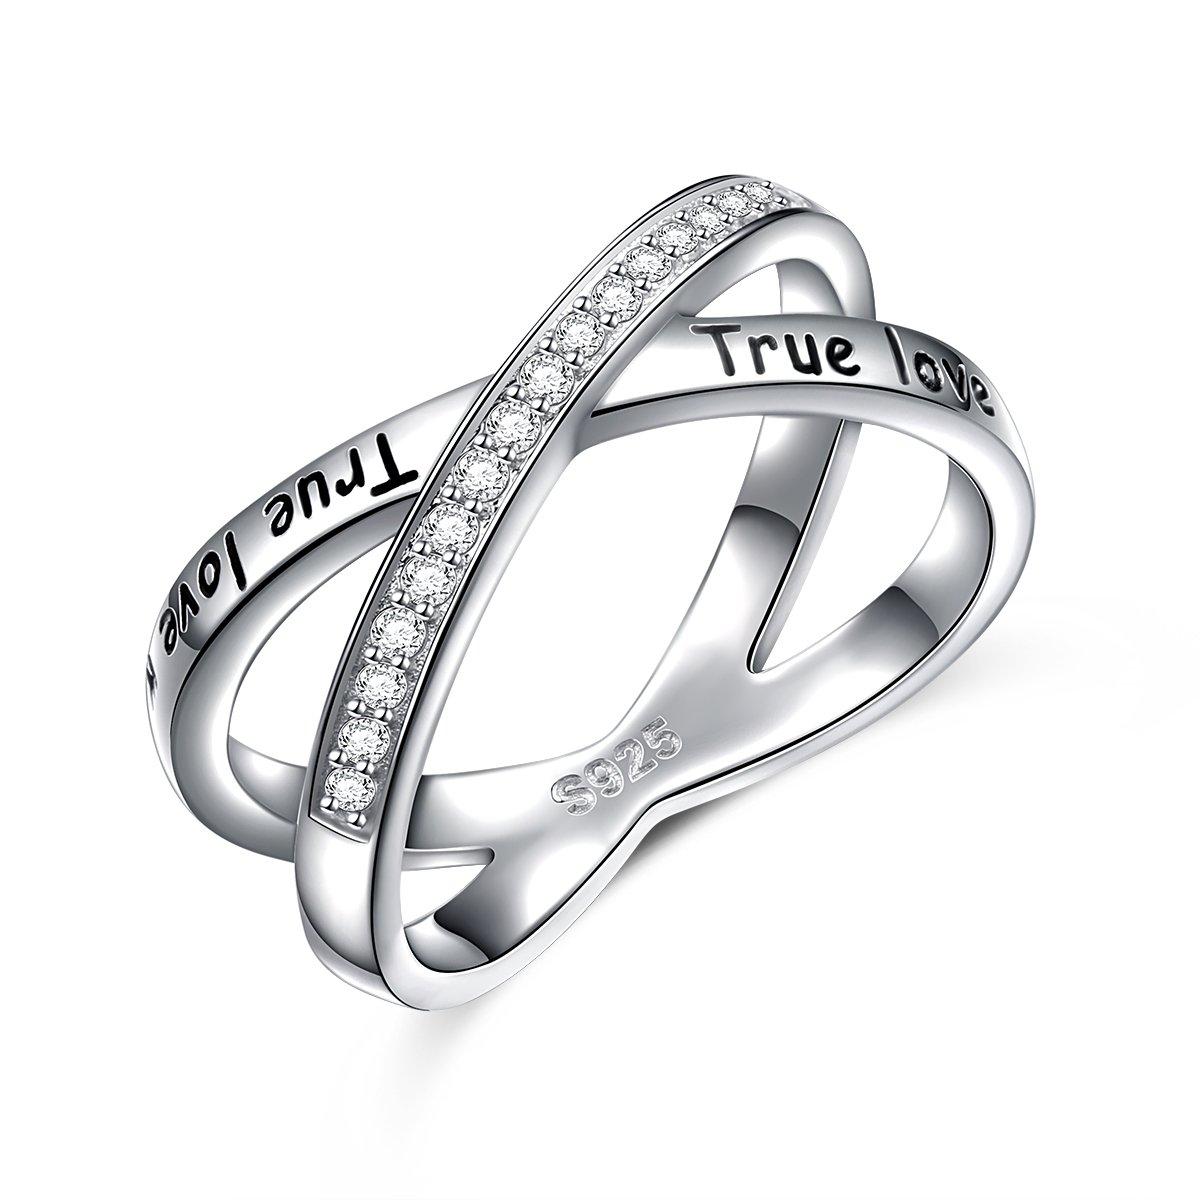 S925 Sterling Silver True Love Waits Infinity Criss Cross Rings for Women Lady (6)